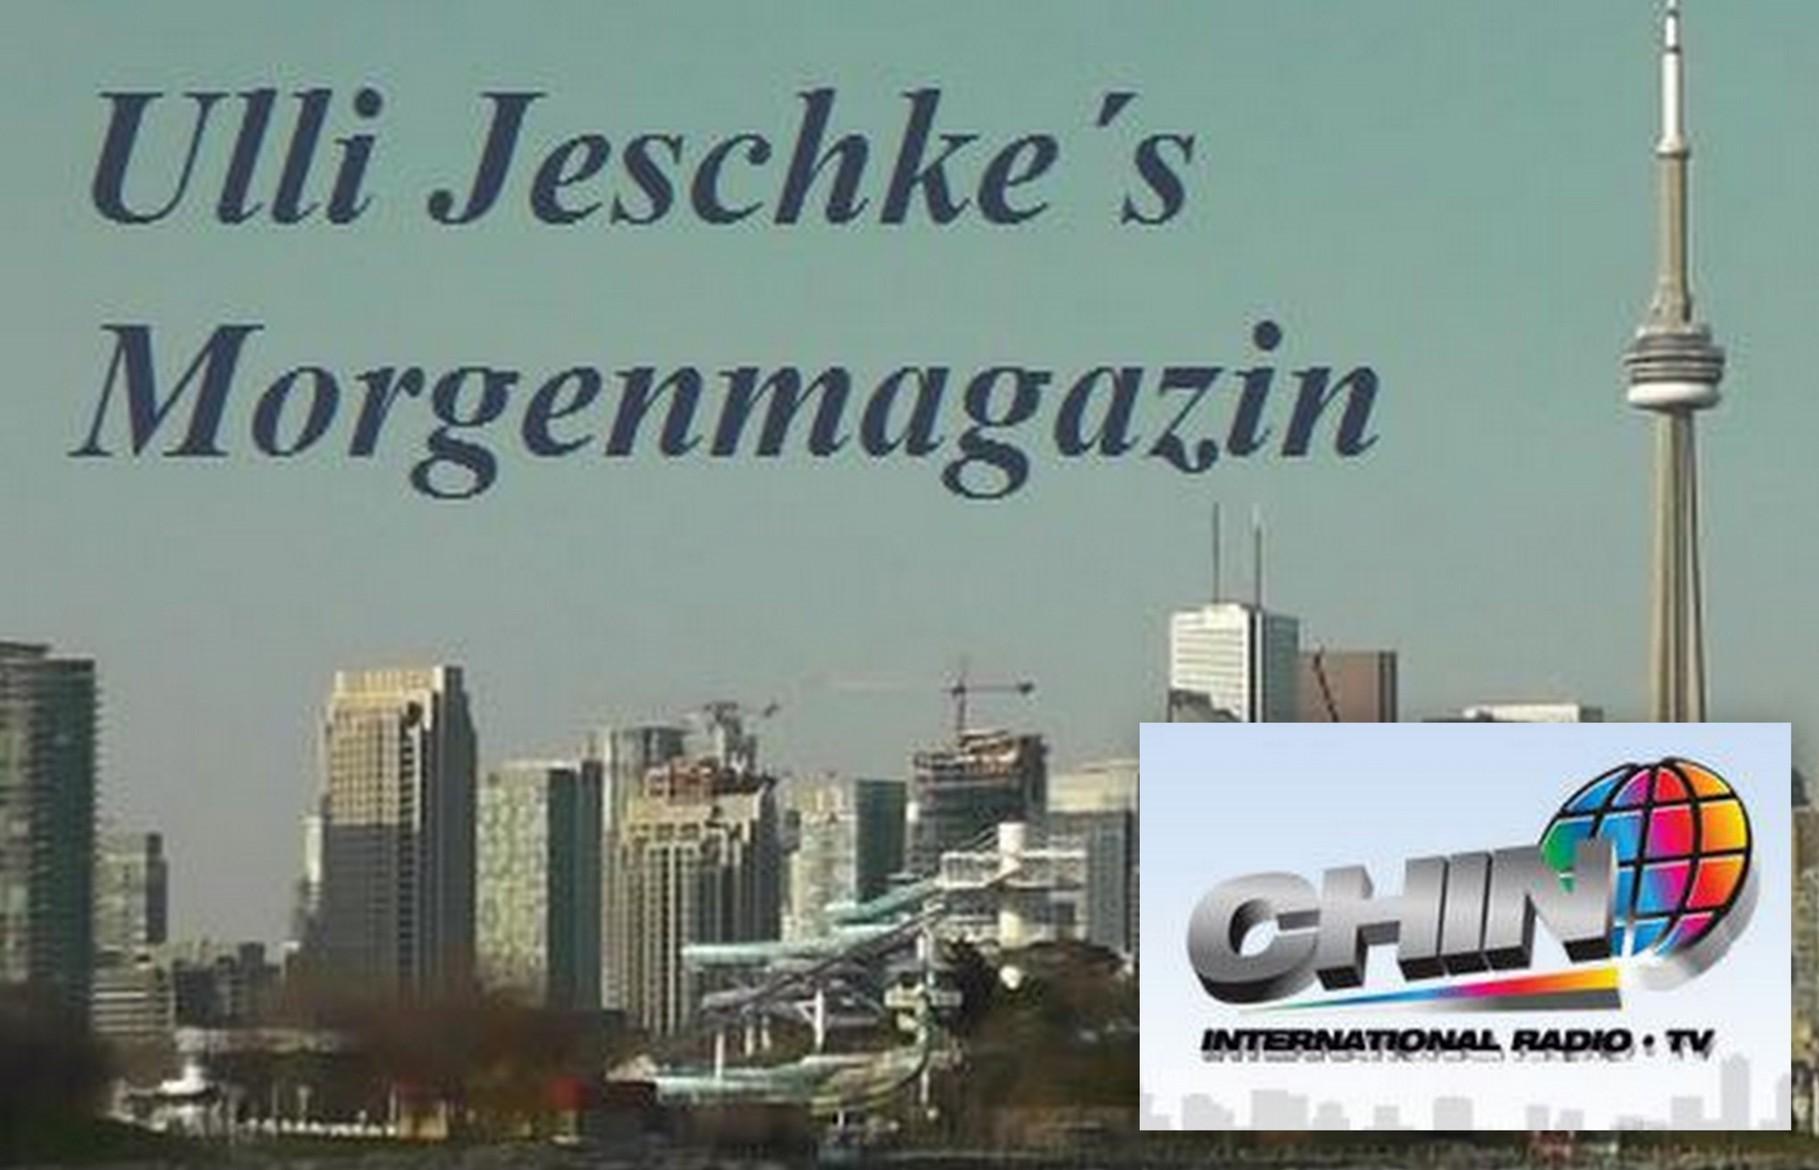 Ulli Jeschke´s Morgenmagazin - CHIN Radio Toronto - Toronto